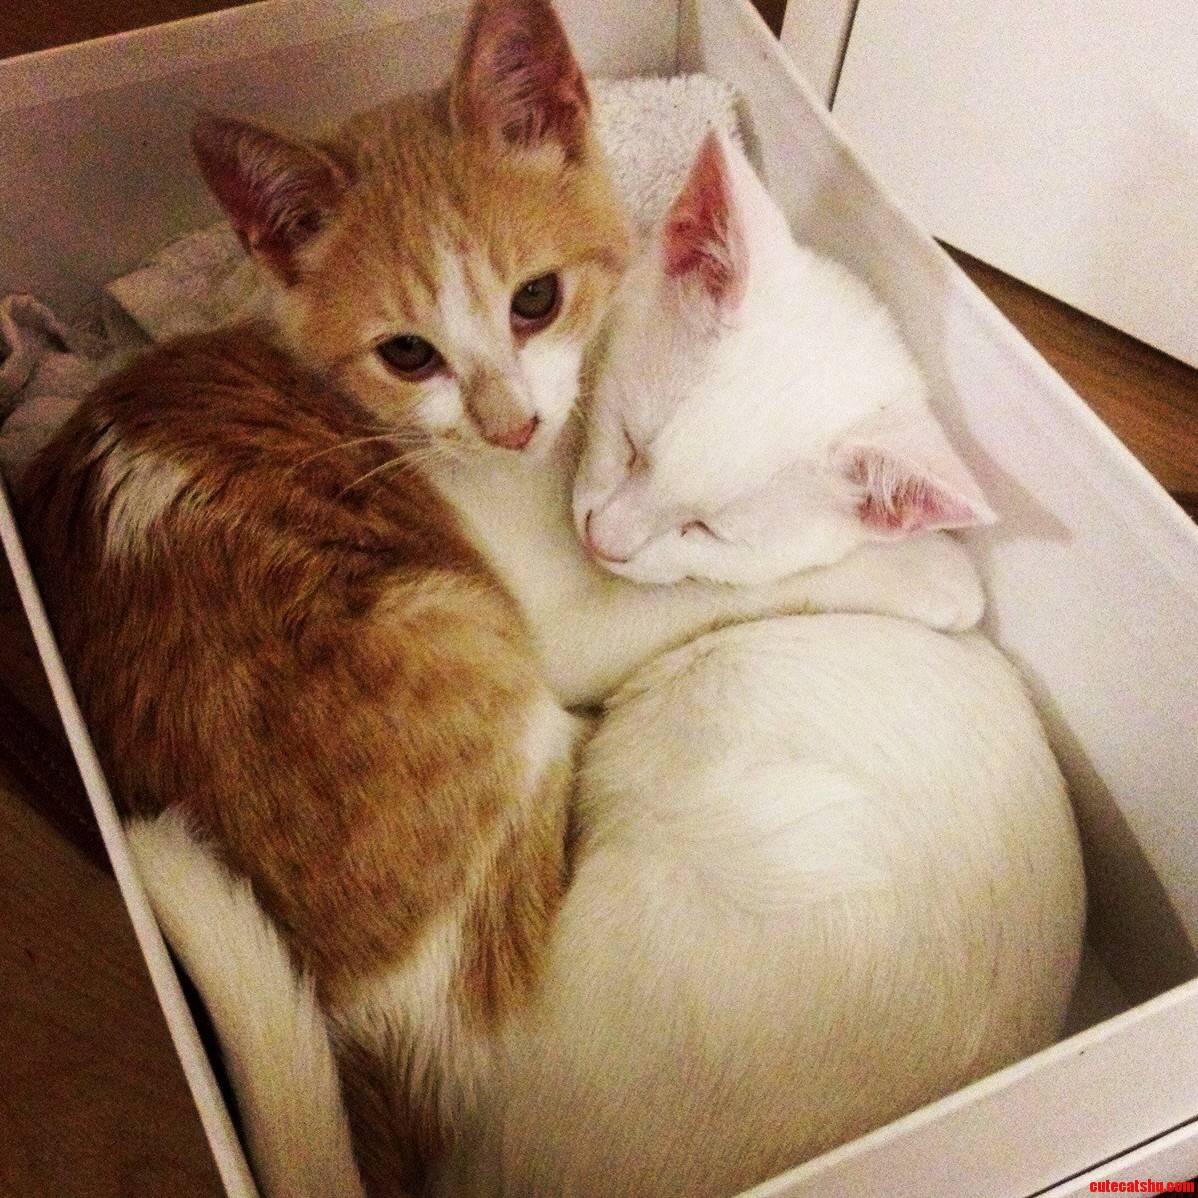 kittens game apocrypha